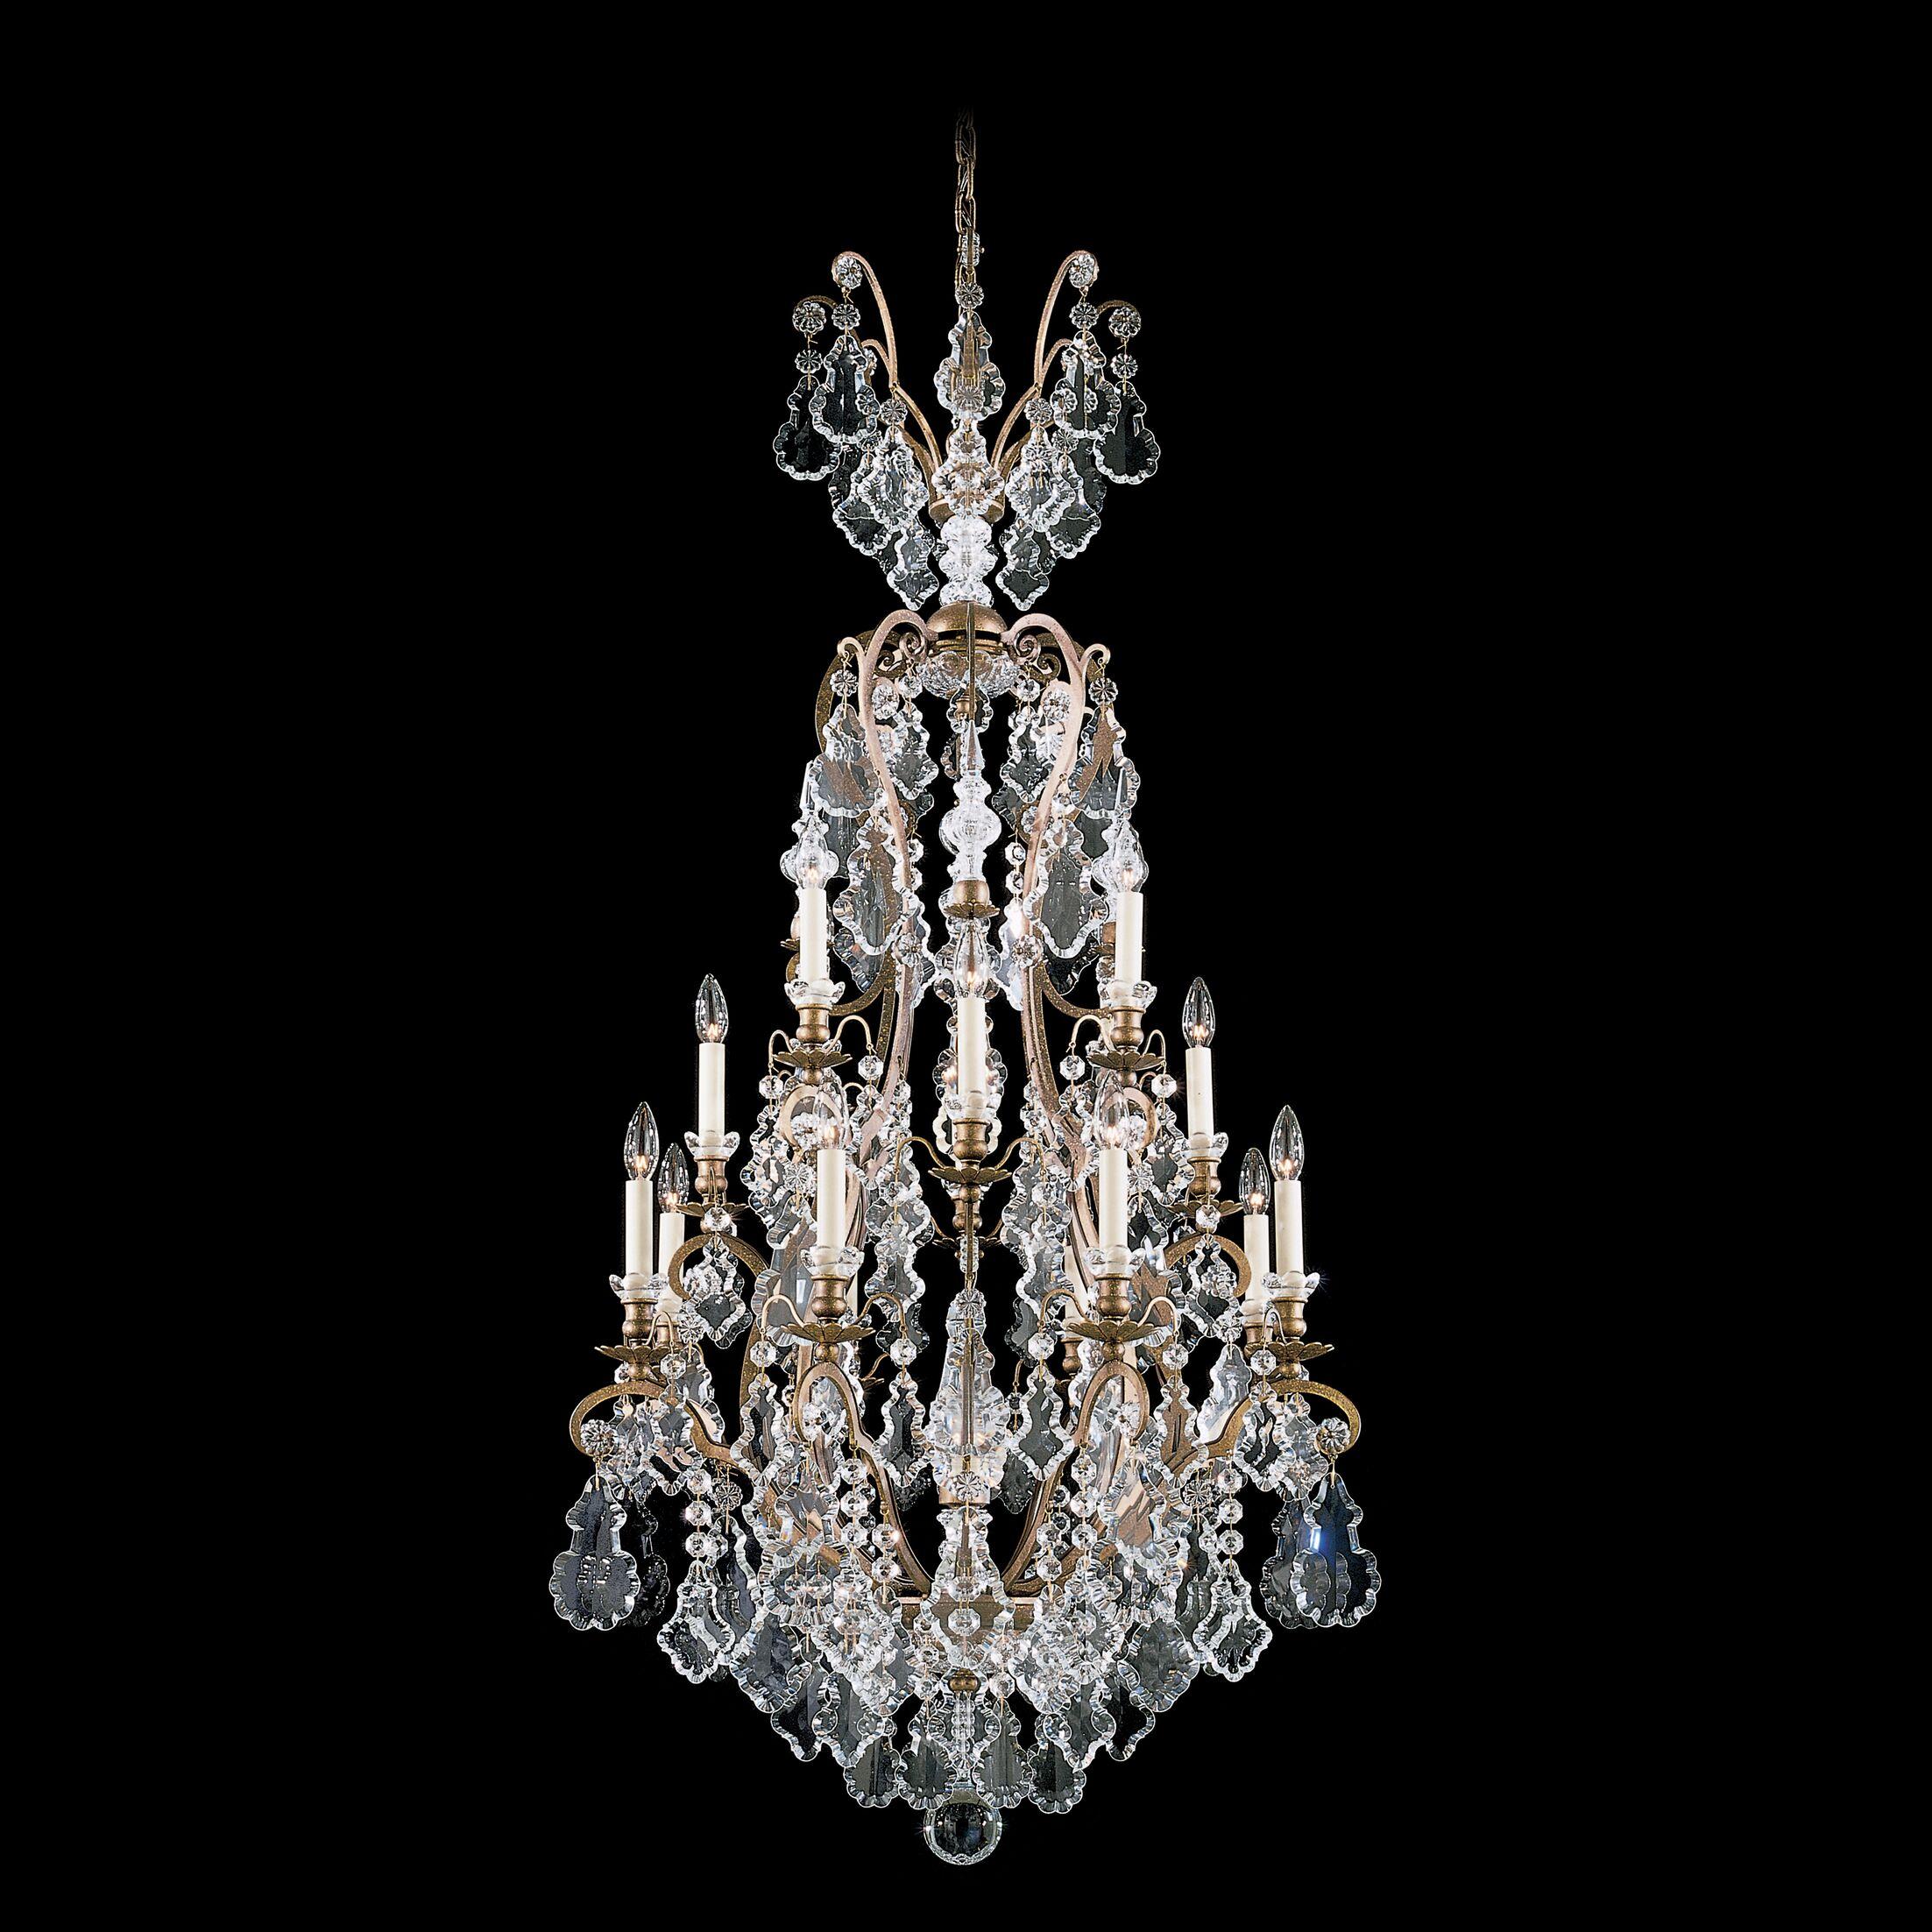 Versailles 16-Light Chandelier Finish: Heirloom Gold